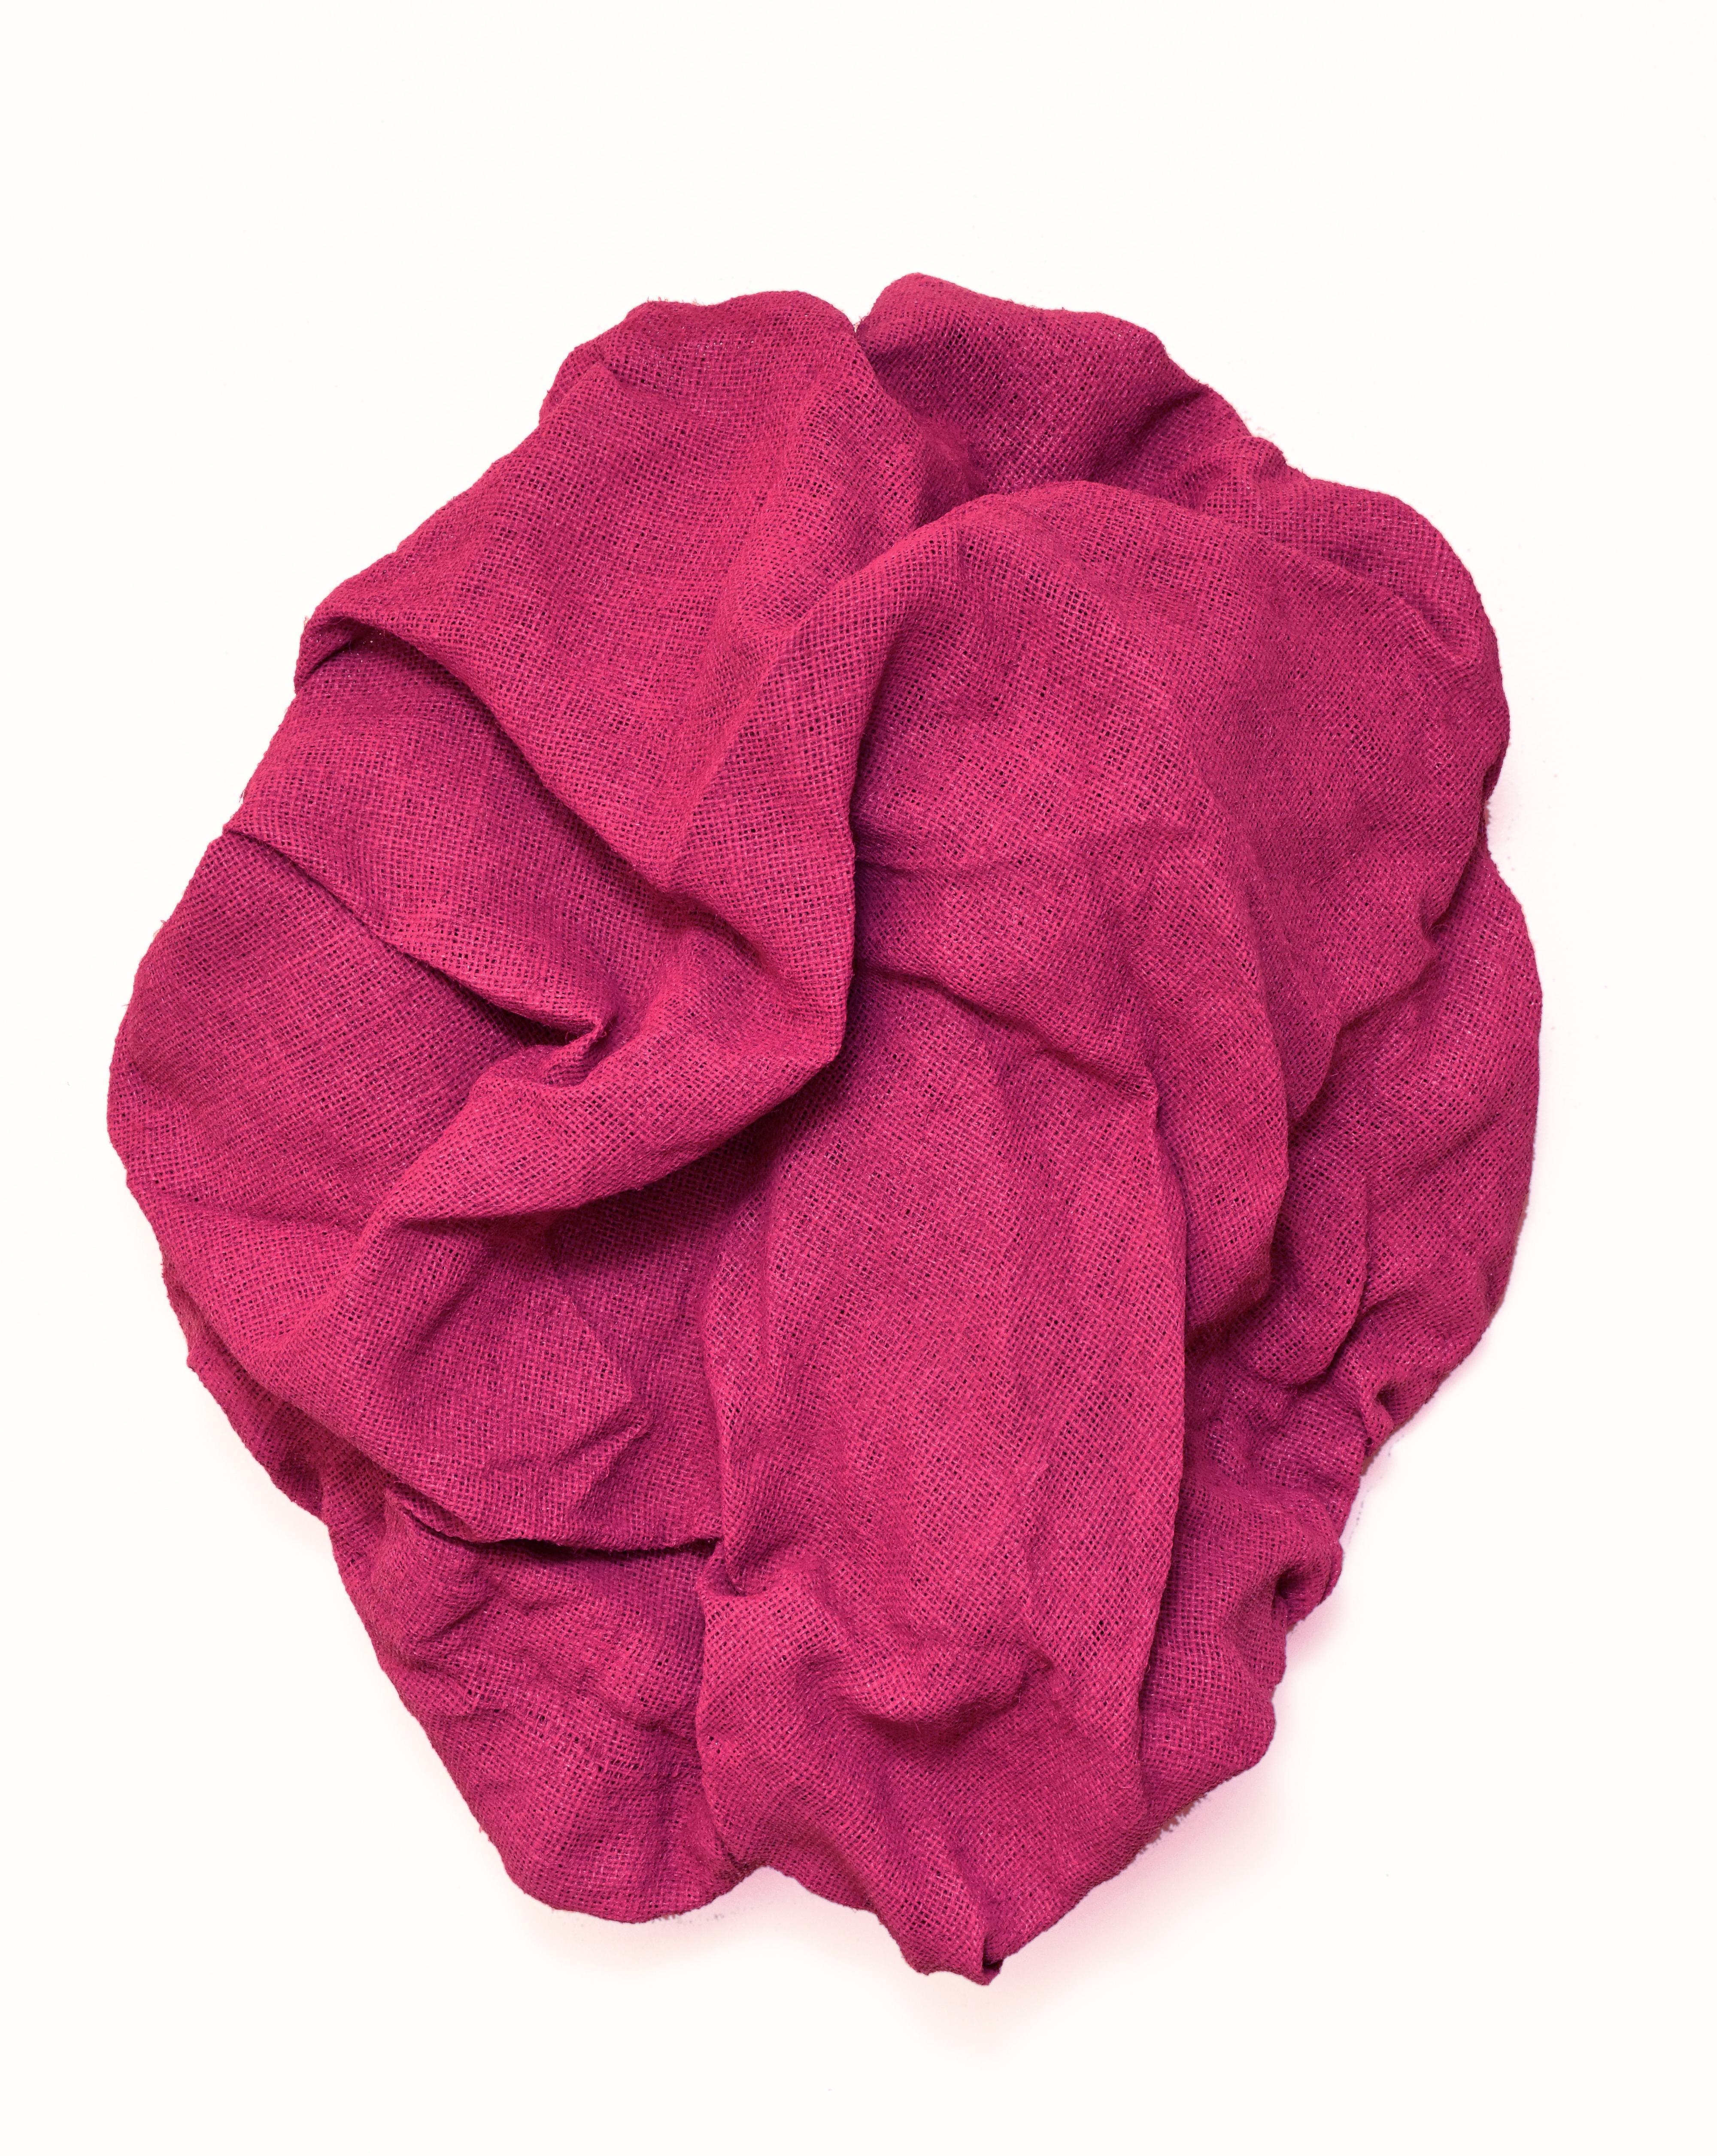 Mambo Pink Folds (fabric, contemporary art design, textile wall sculpture)